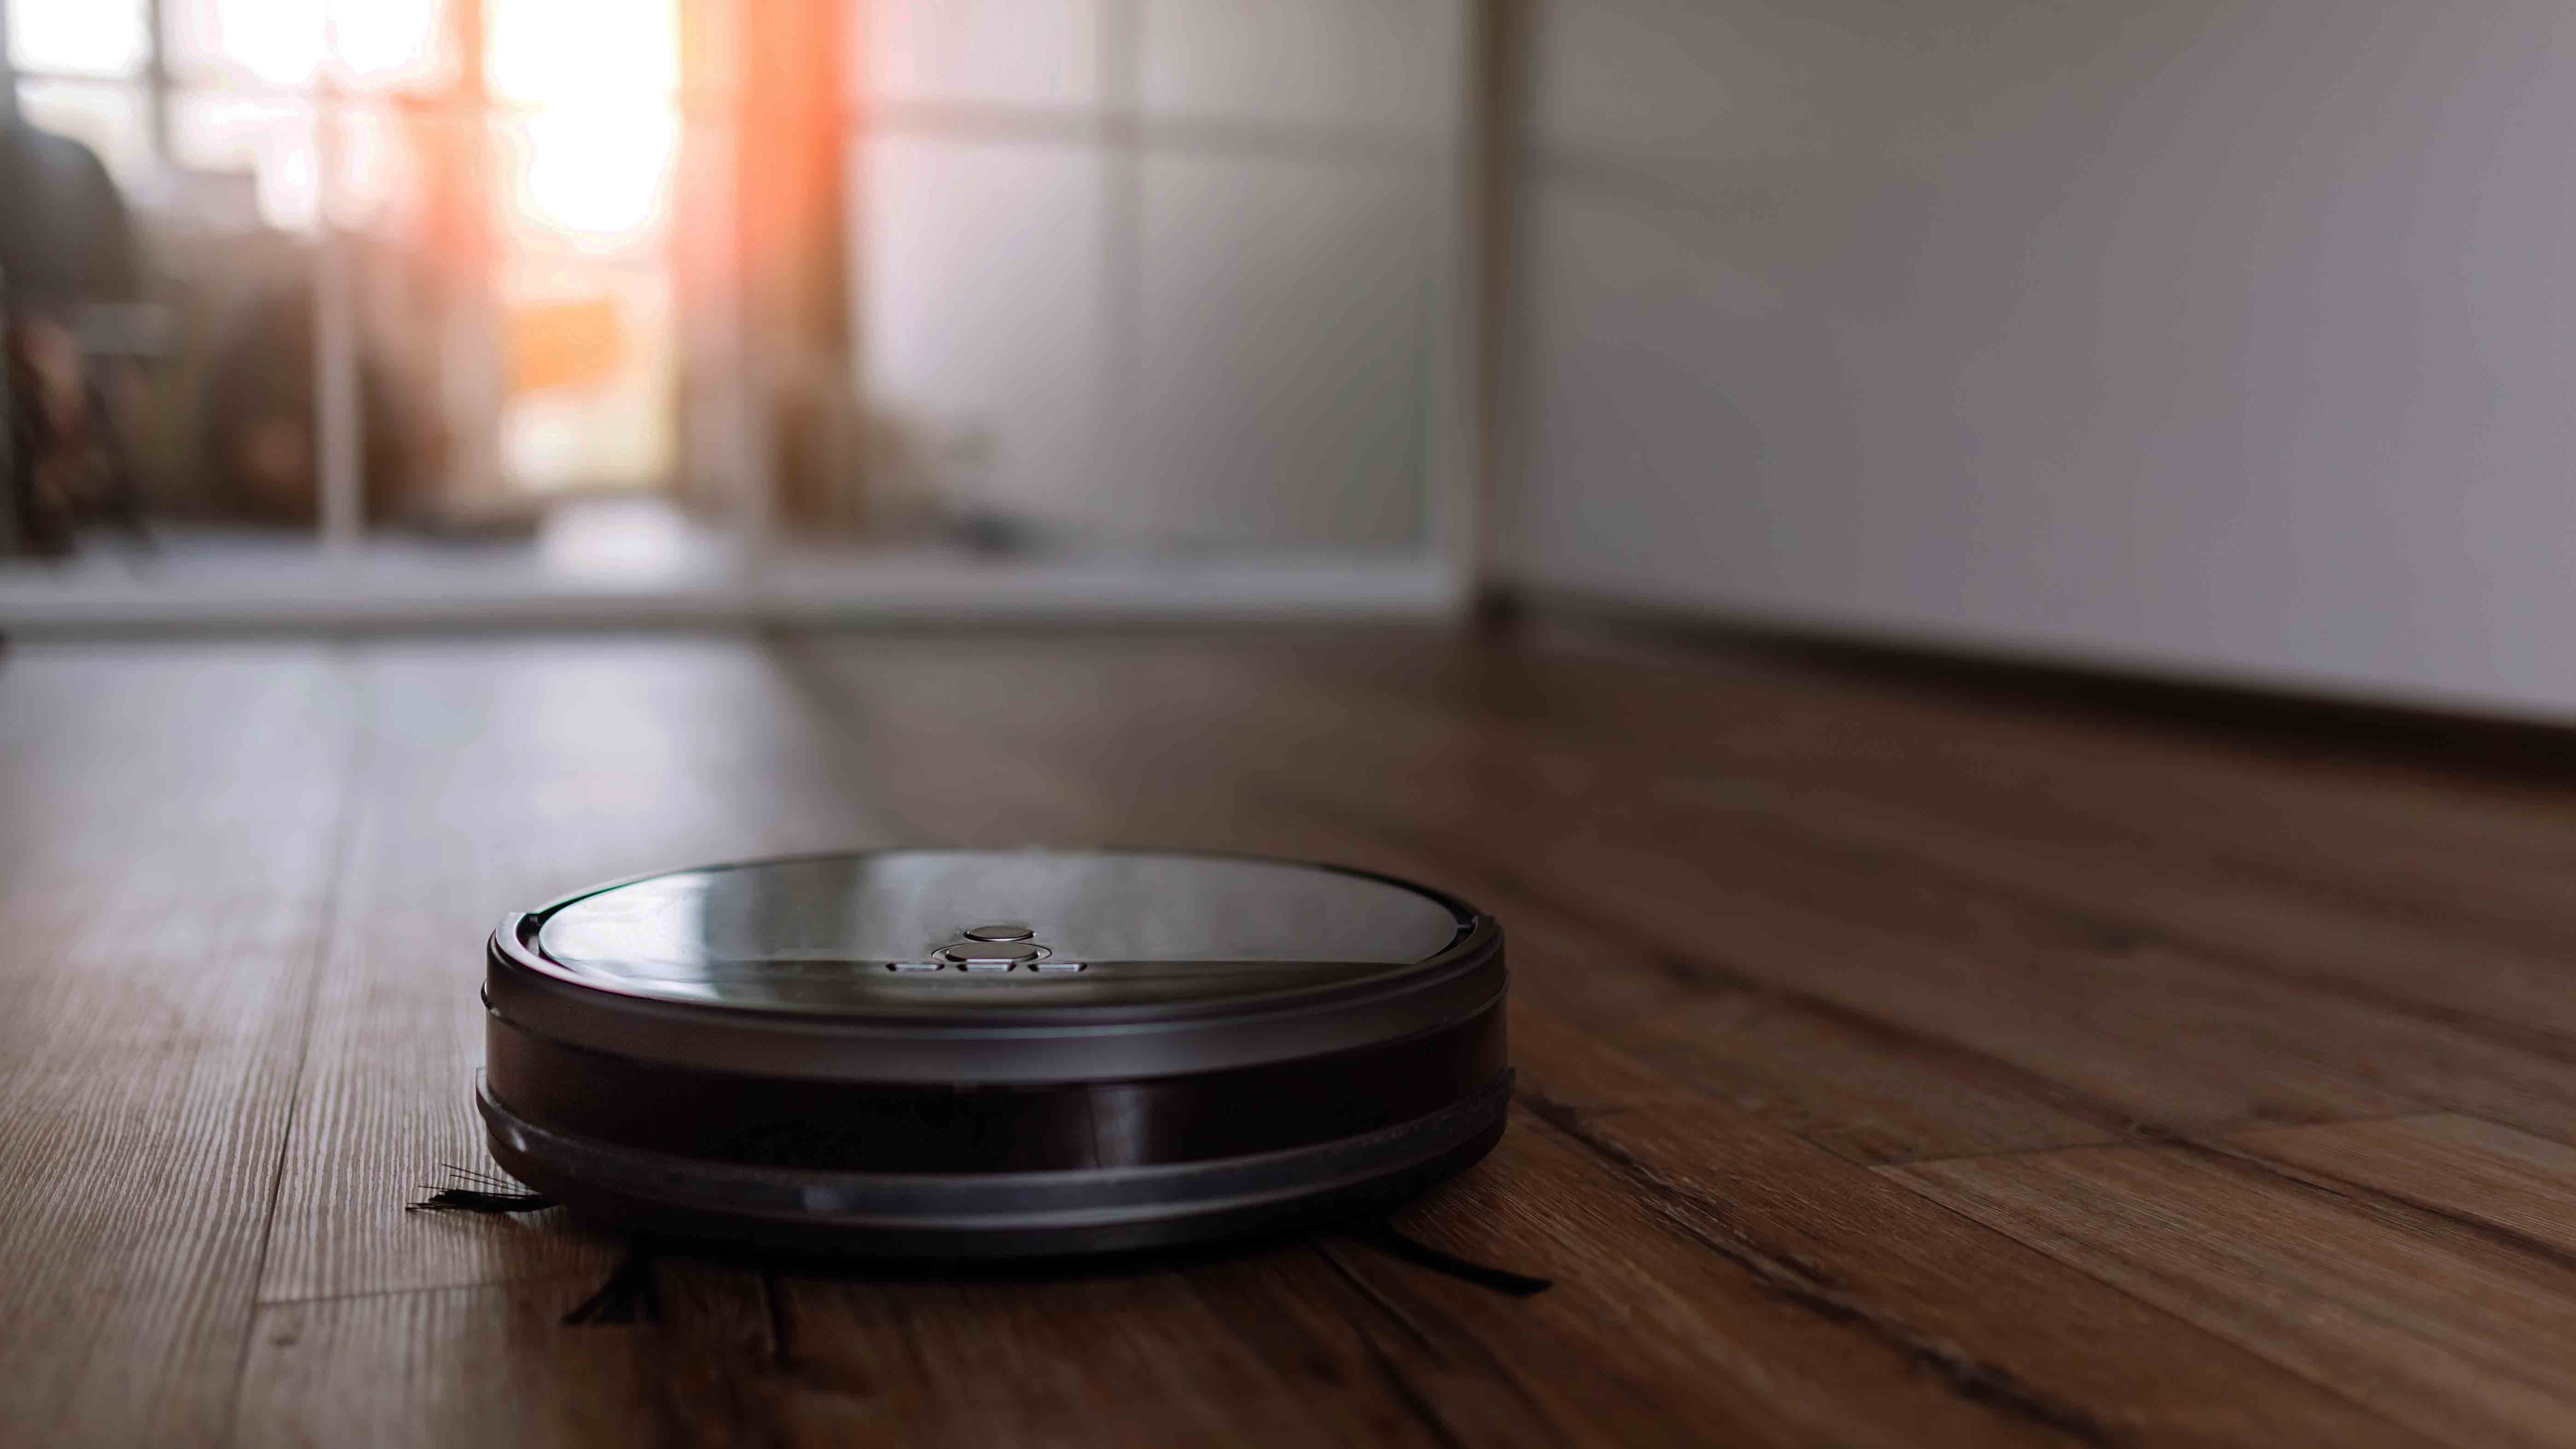 N. Carolina Couple Calls 911 on Robot Vacuum Mistaken for Intruder